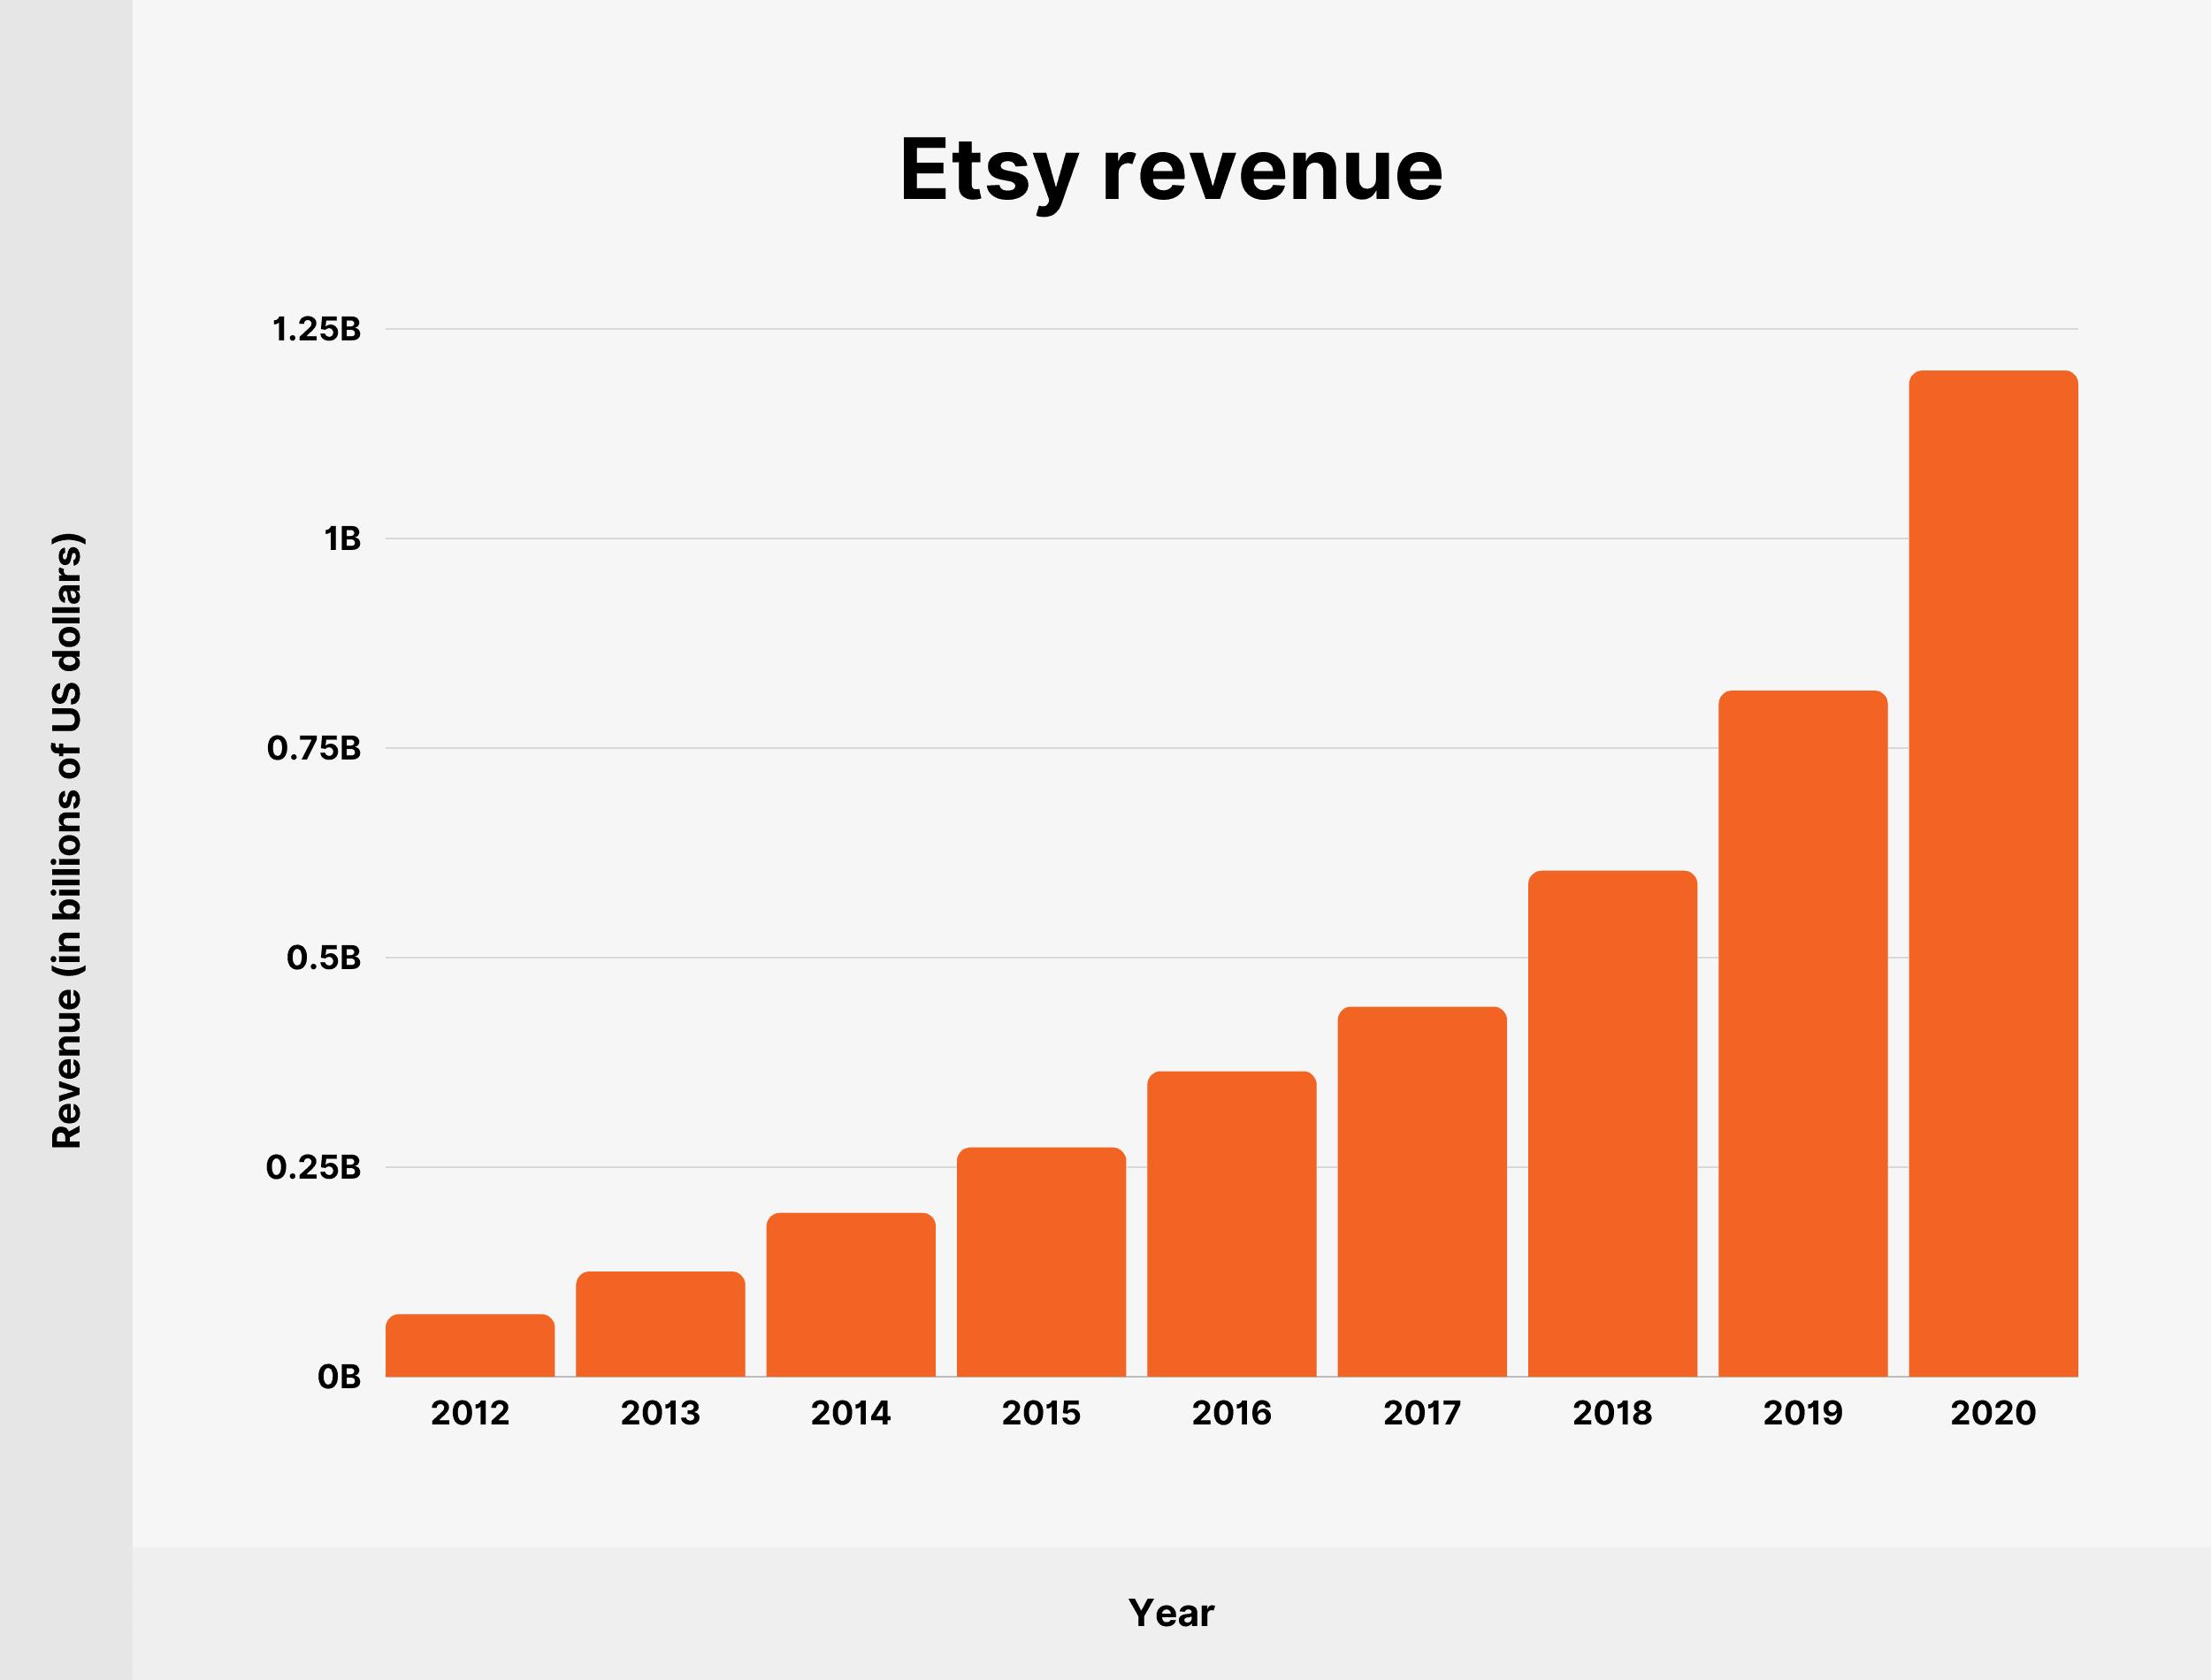 Etsy revenue